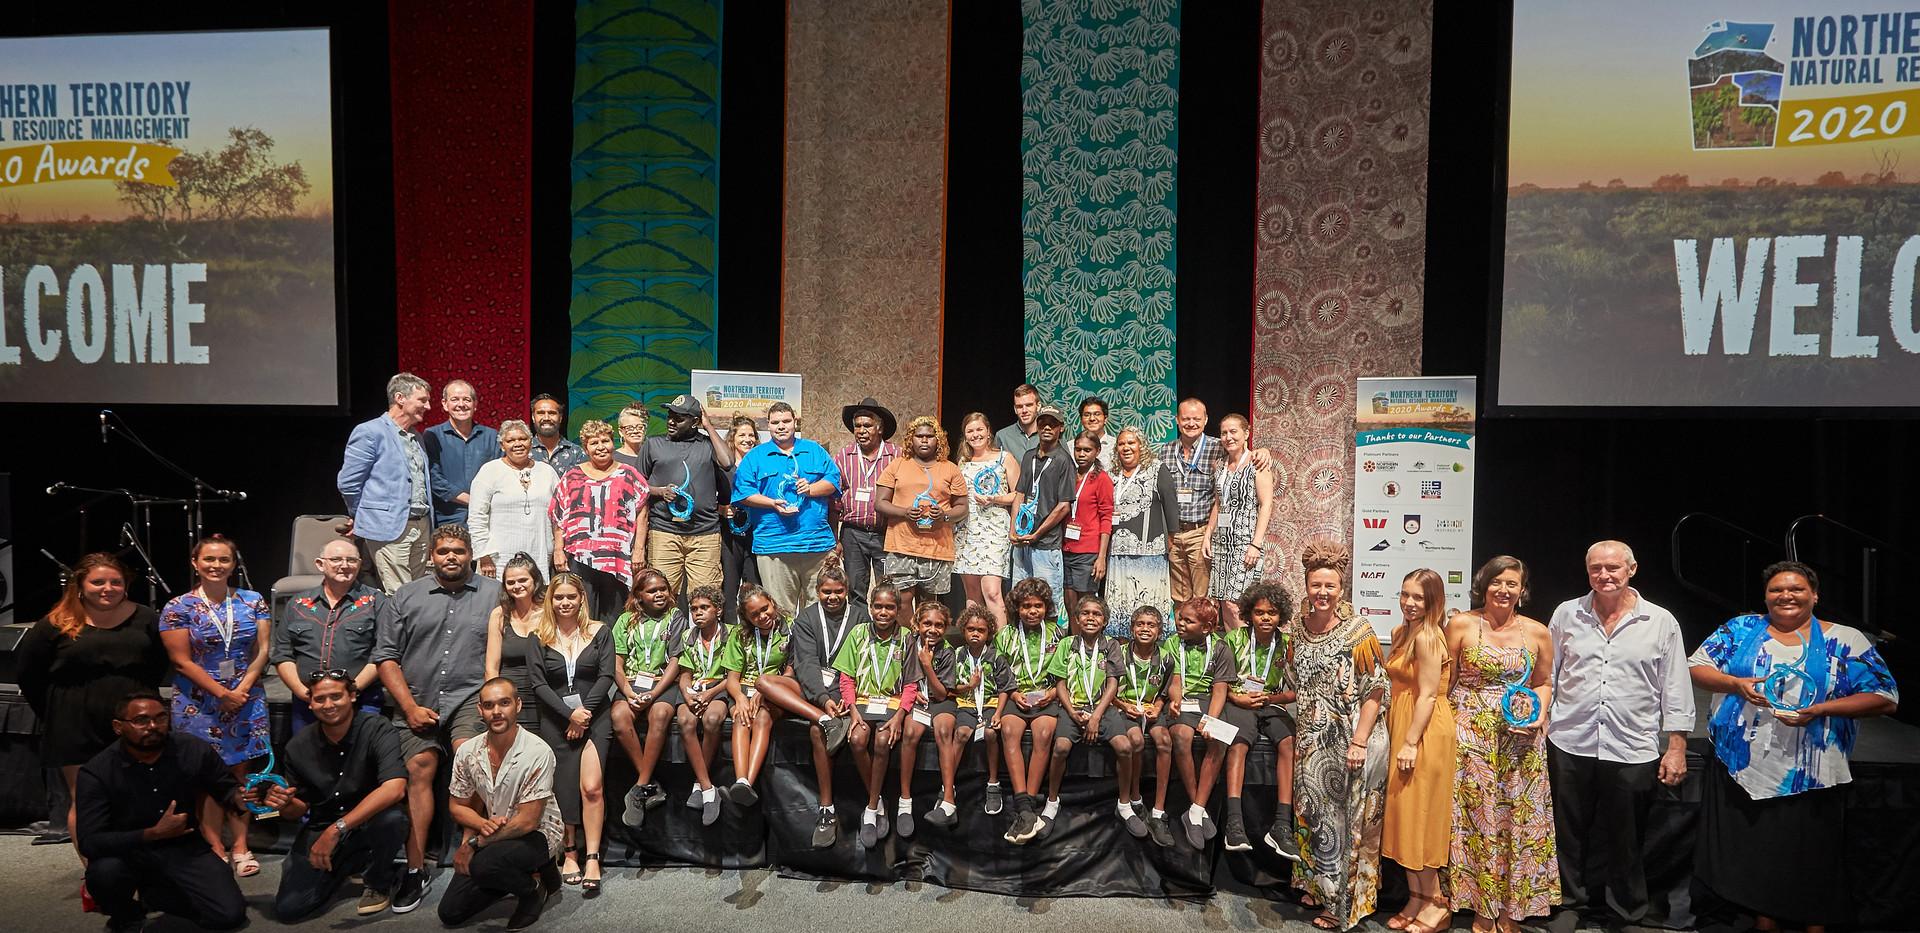 2020 NT NRM Award Winners